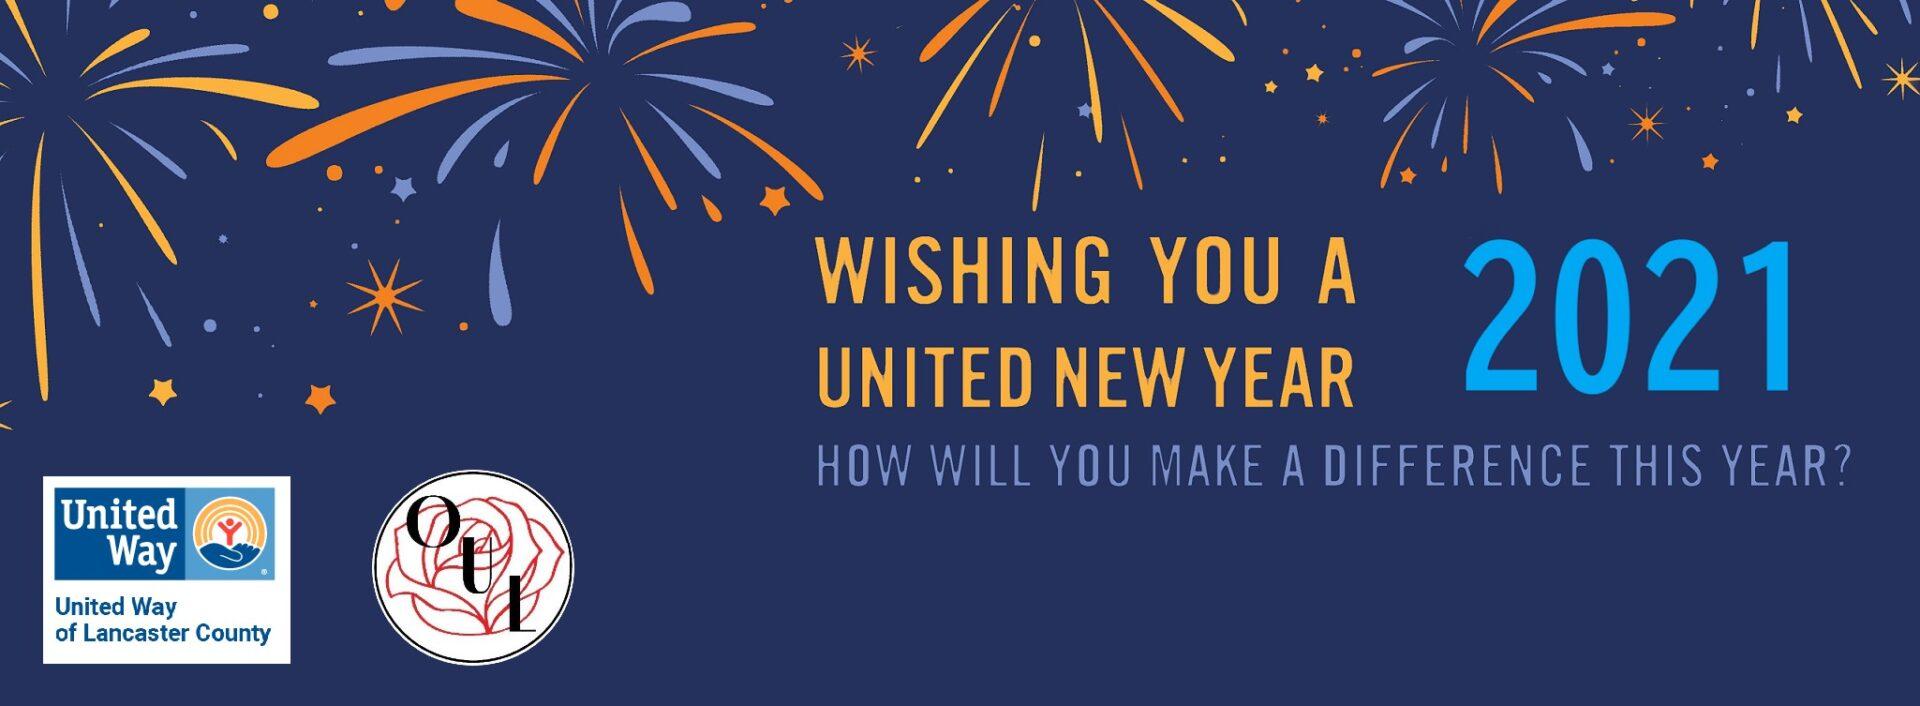 Happy New Year 2021 UW OUL